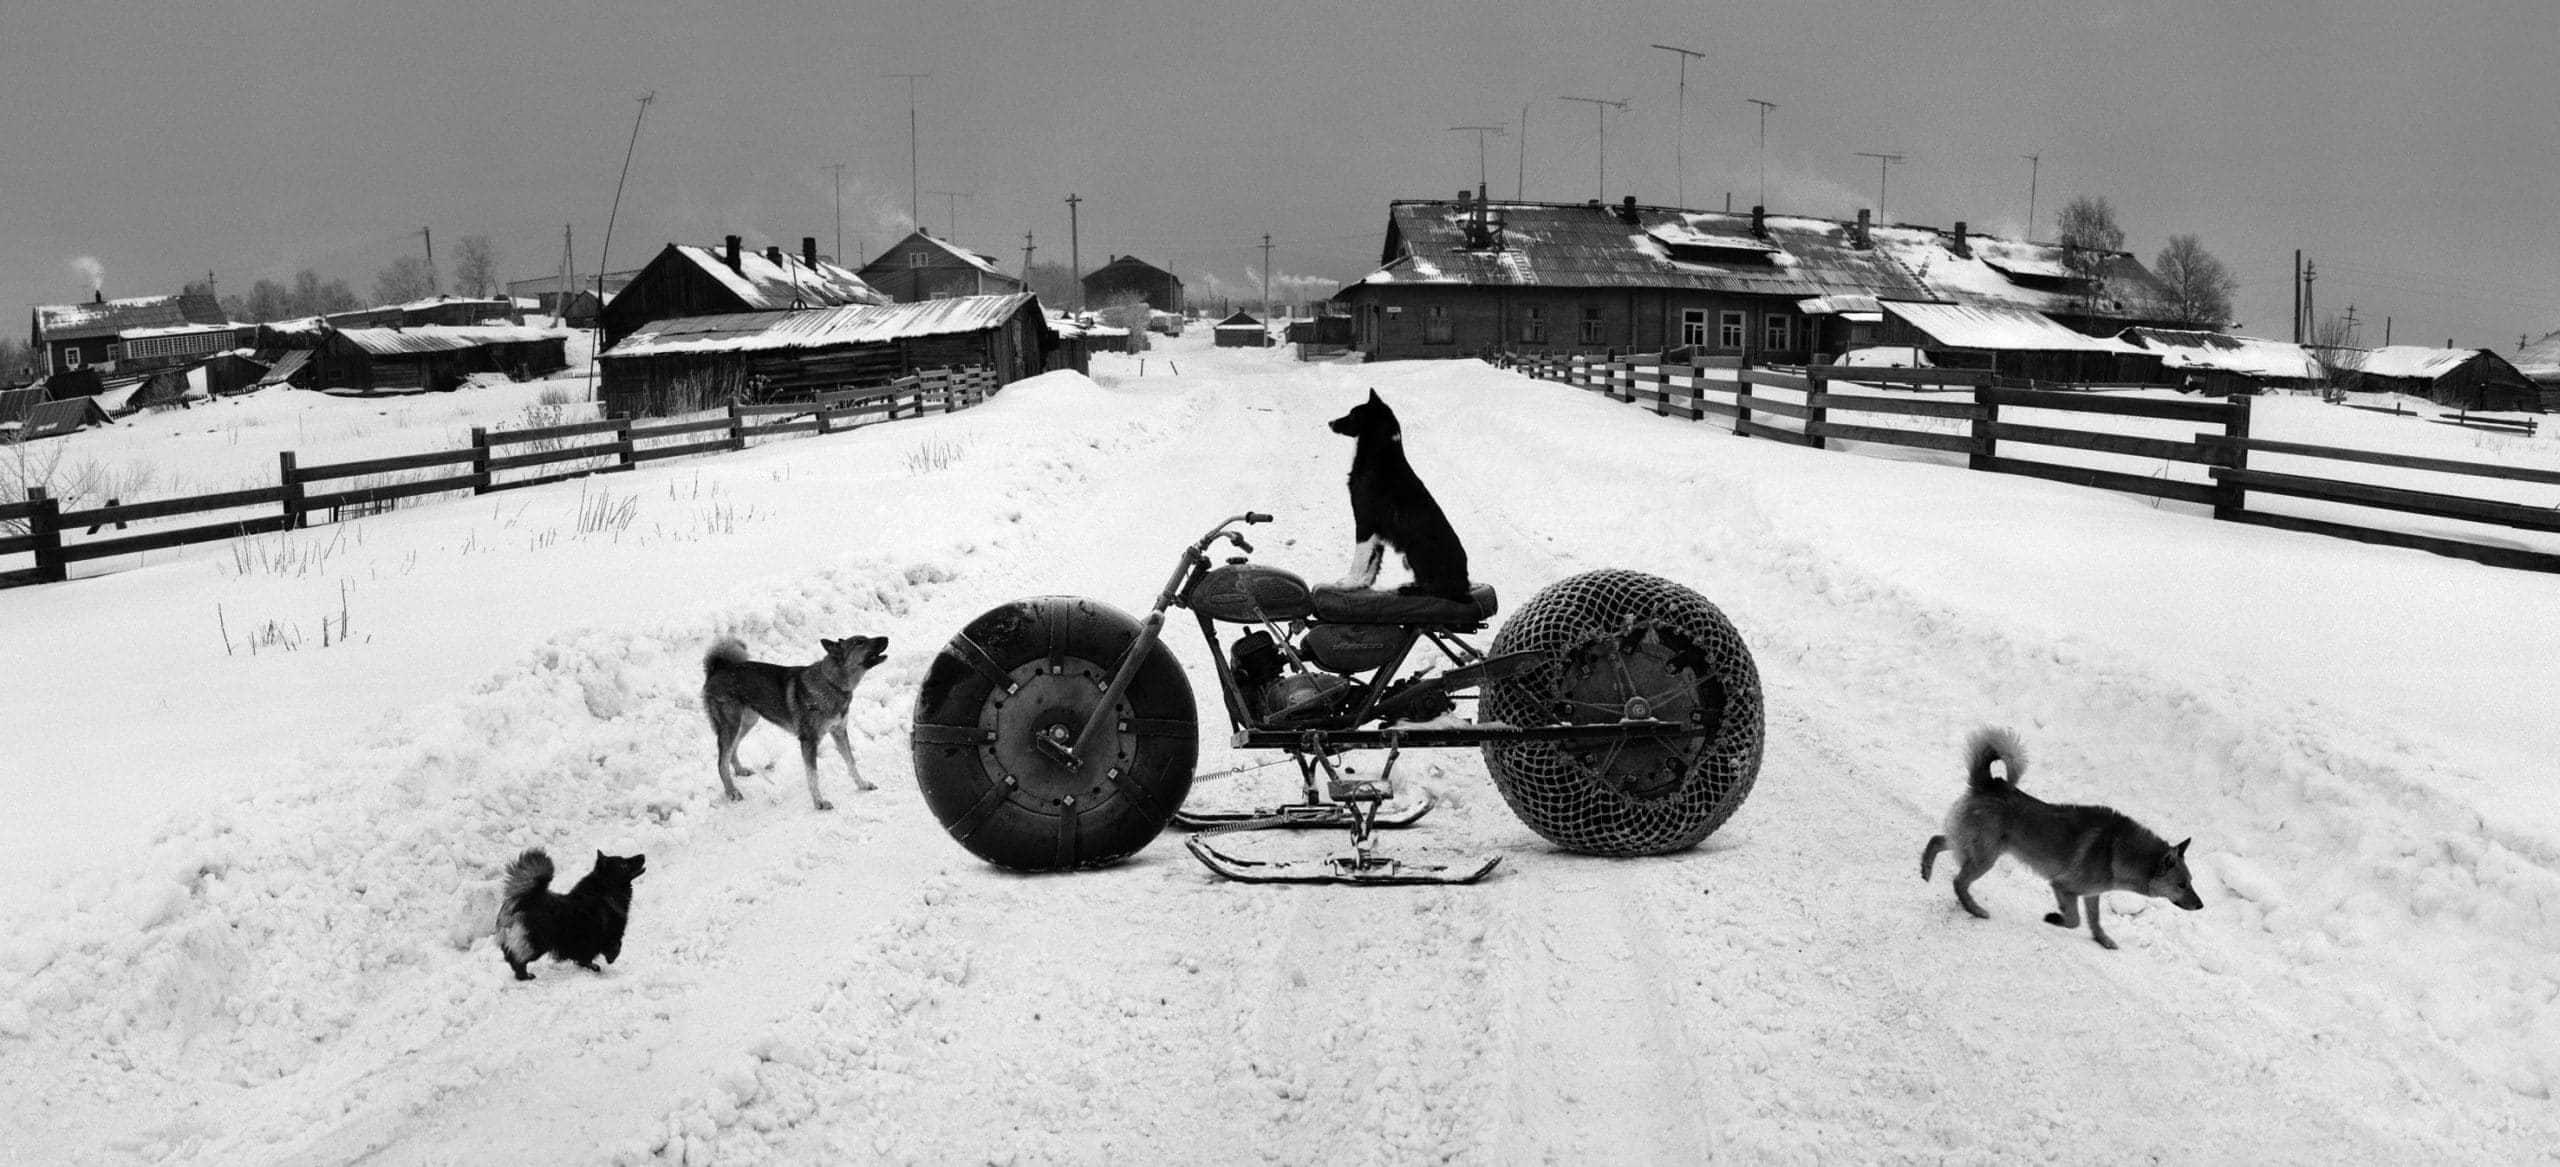 Solovki, White Sea, Russia (Dog on Motorbike), 1992